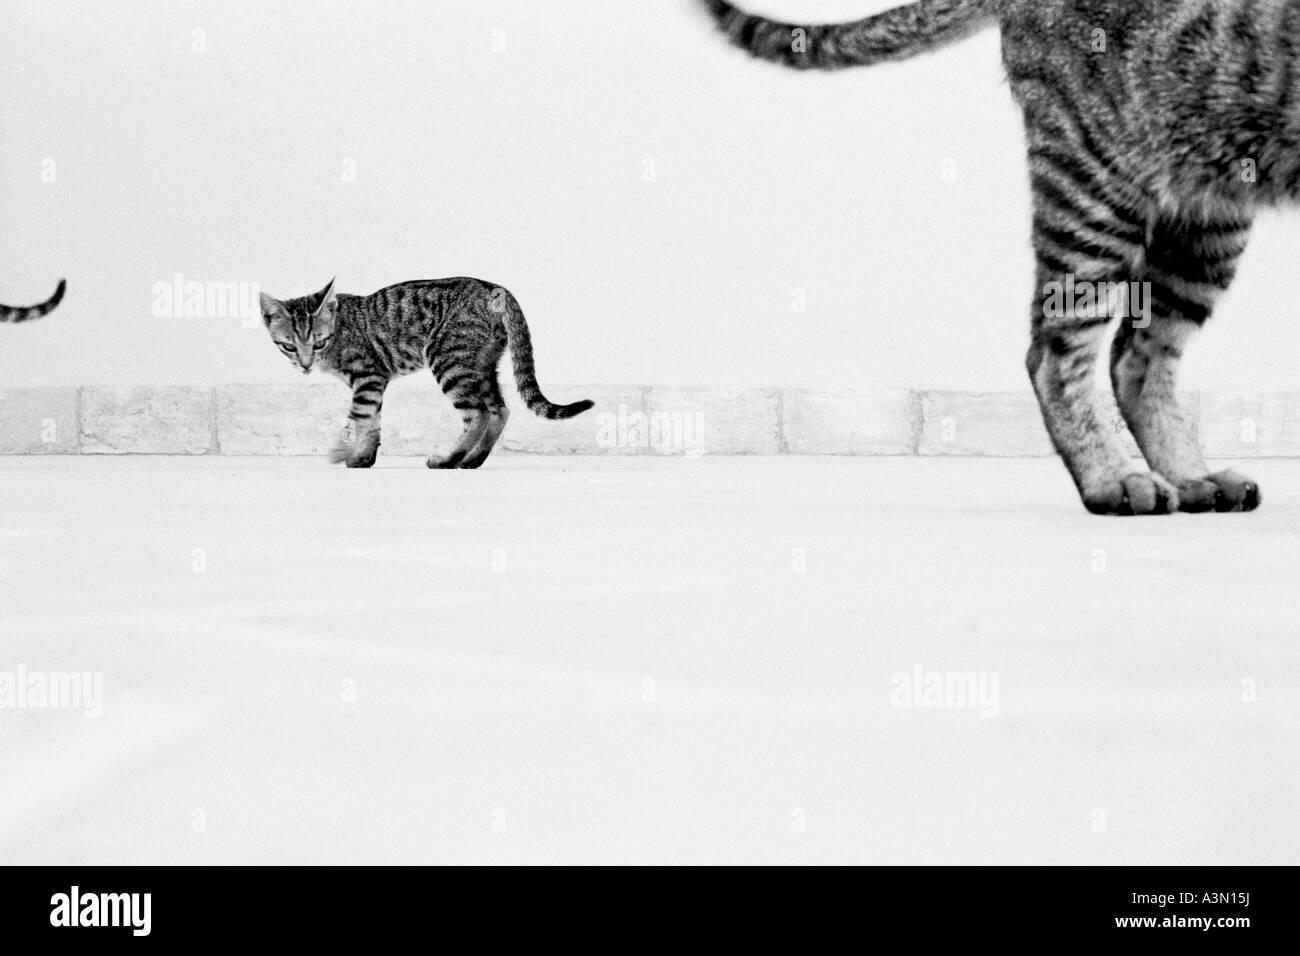 Still cat tails - Stock Image